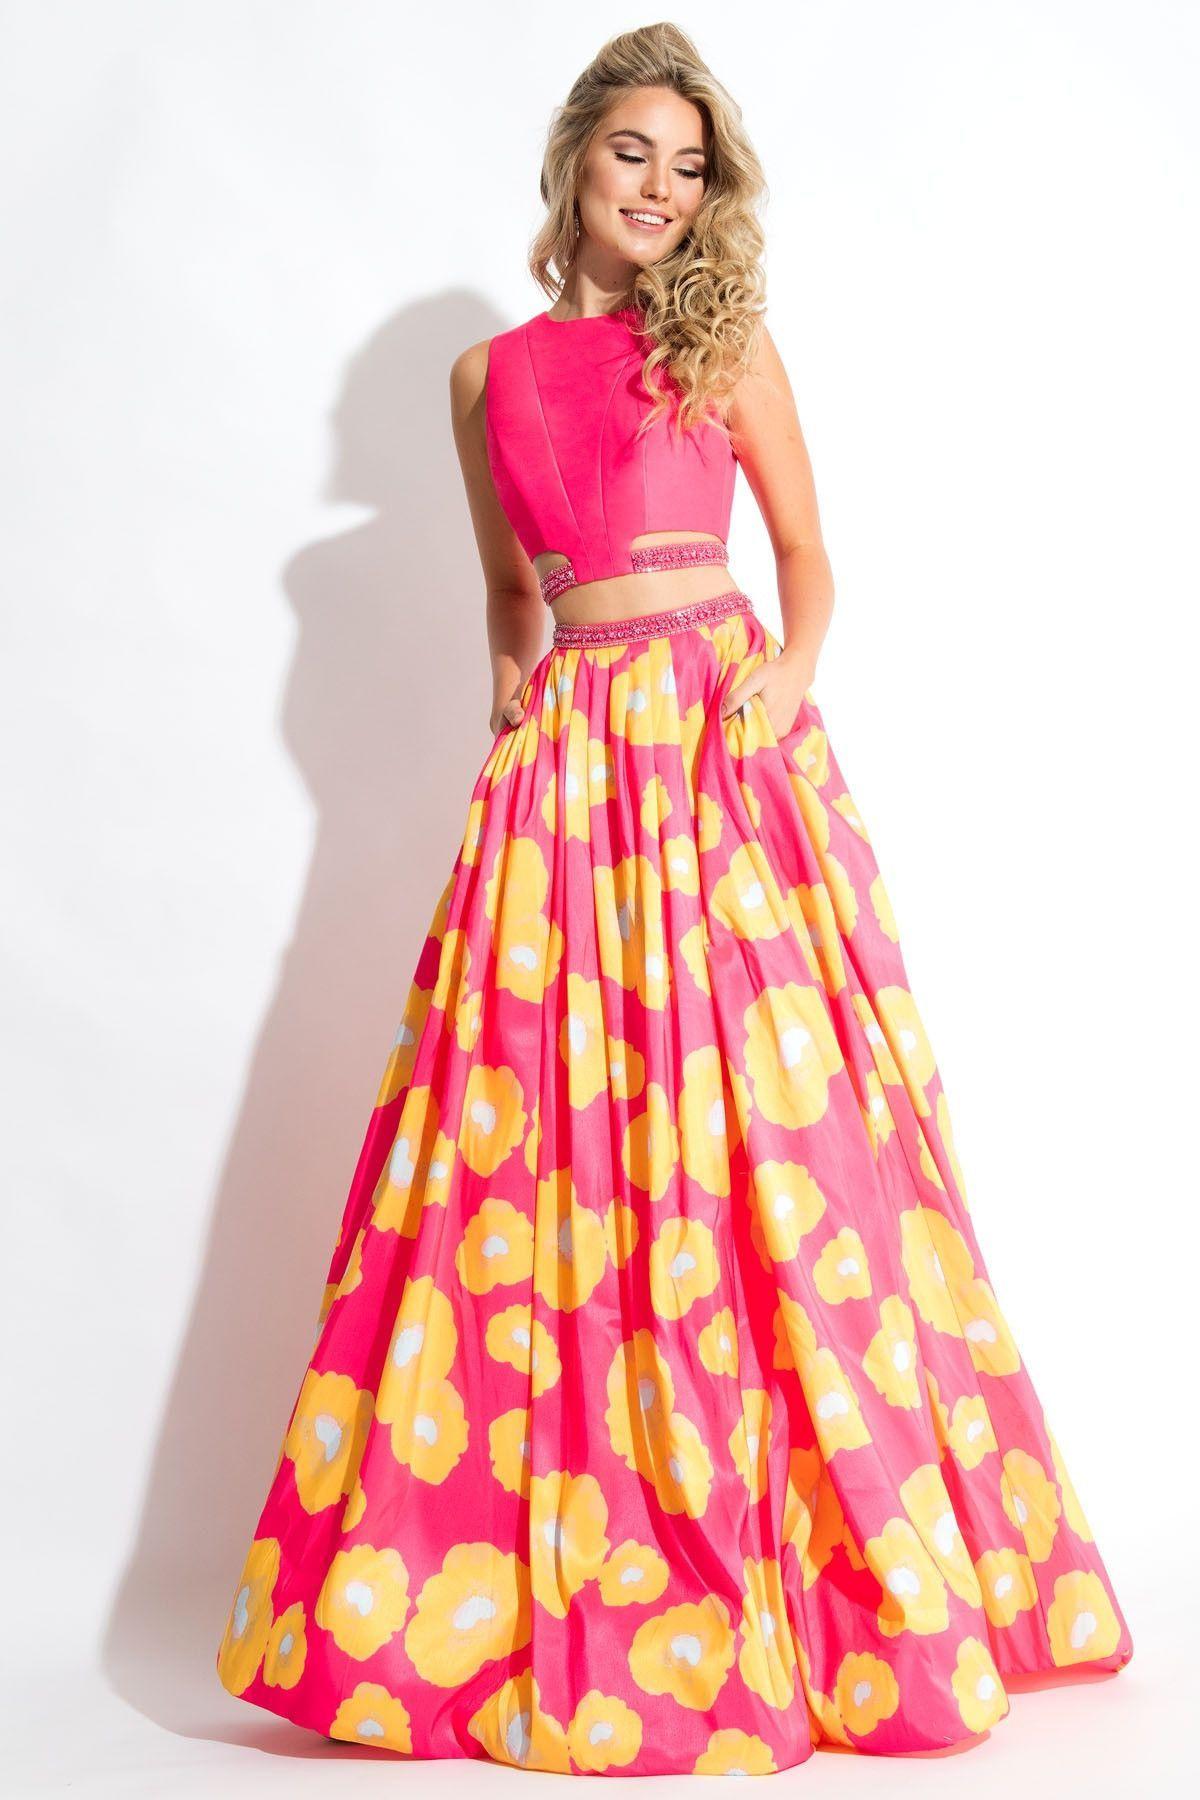 240da85aead8f Rachel Allen 2 piece floral prom dress, Fuchsia/Yellow Size 2 In ...